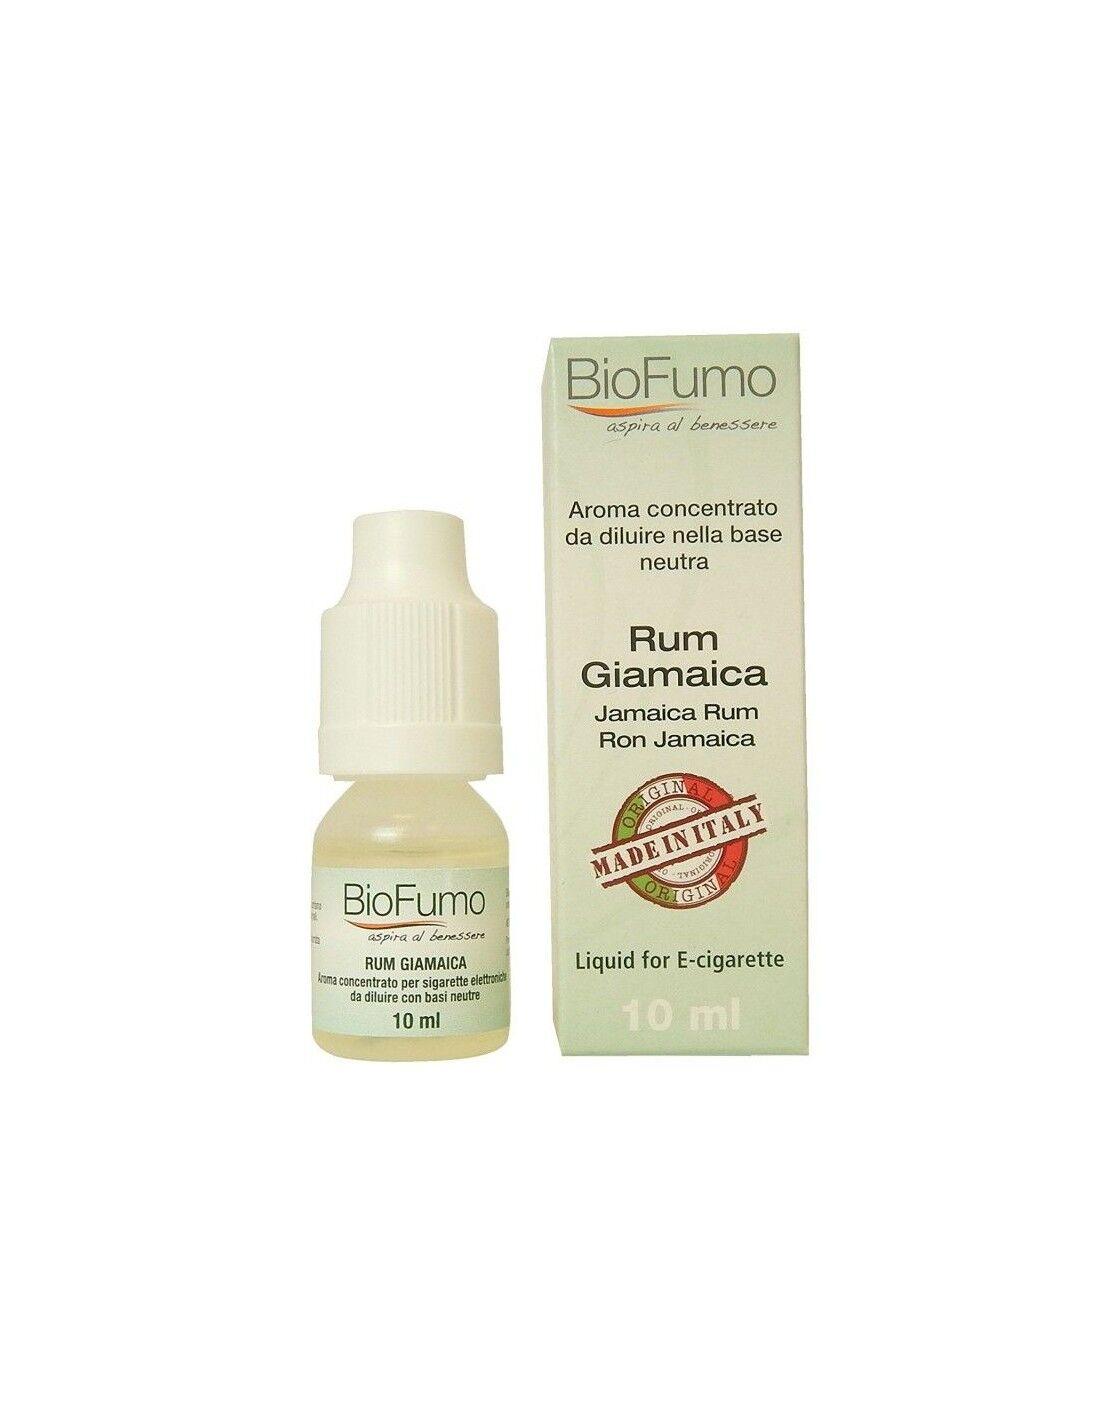 Biofumo Rum Giamaica Aroma